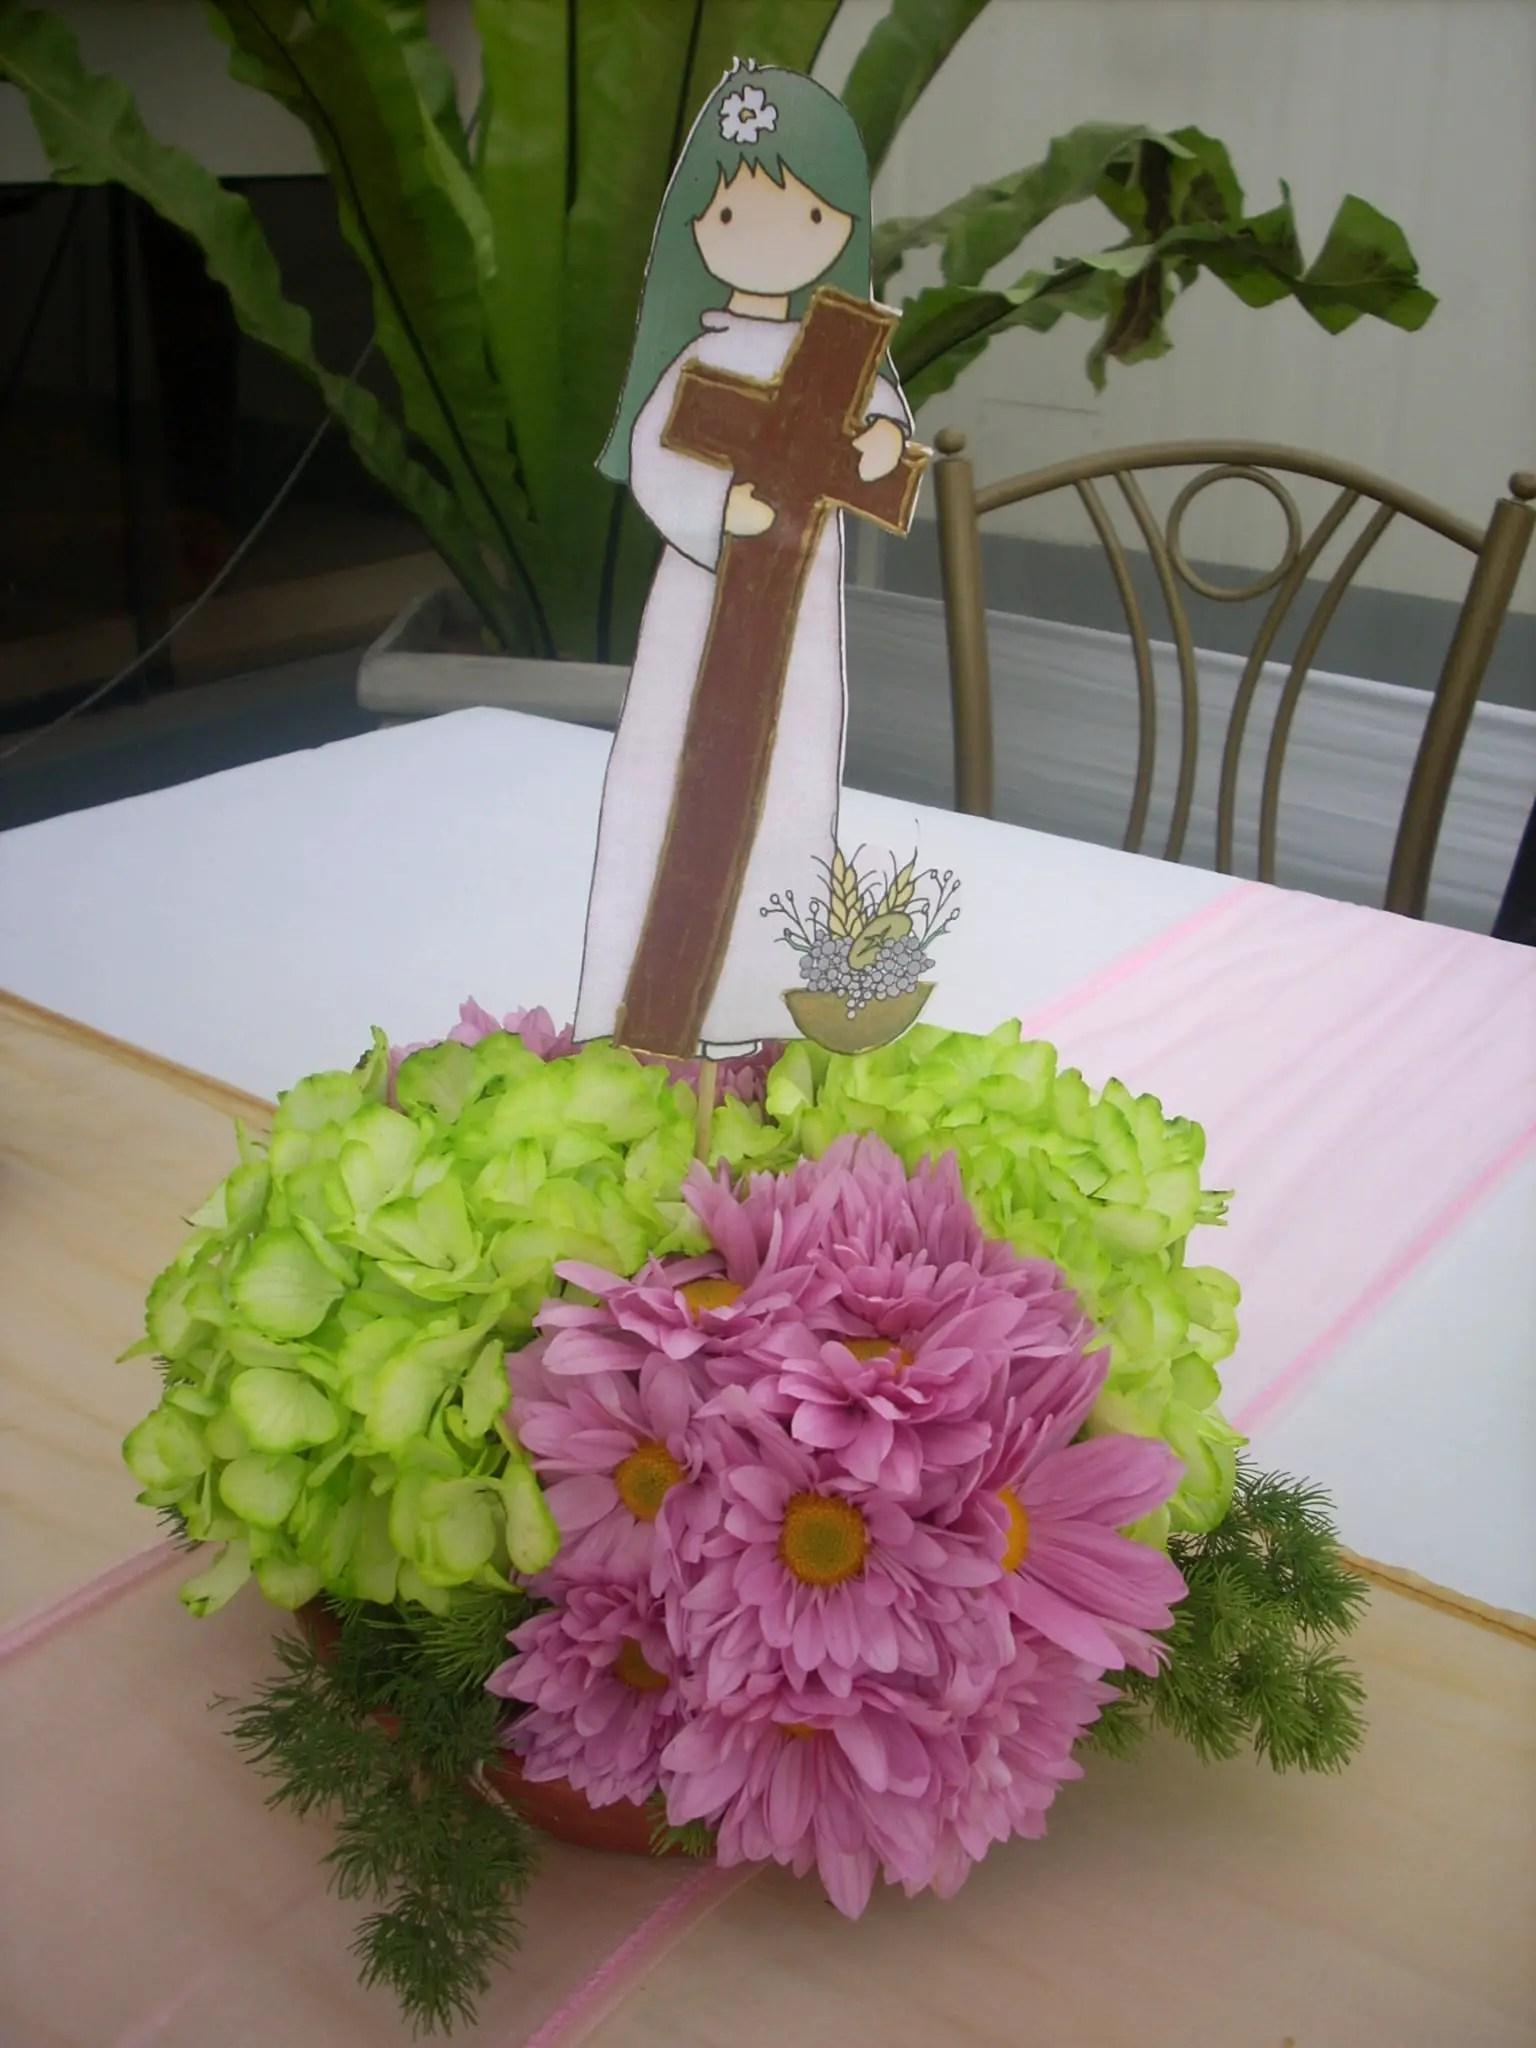 Centros de mesa para primera comuni n dale detalles - Centros d mesa primera comunion ...